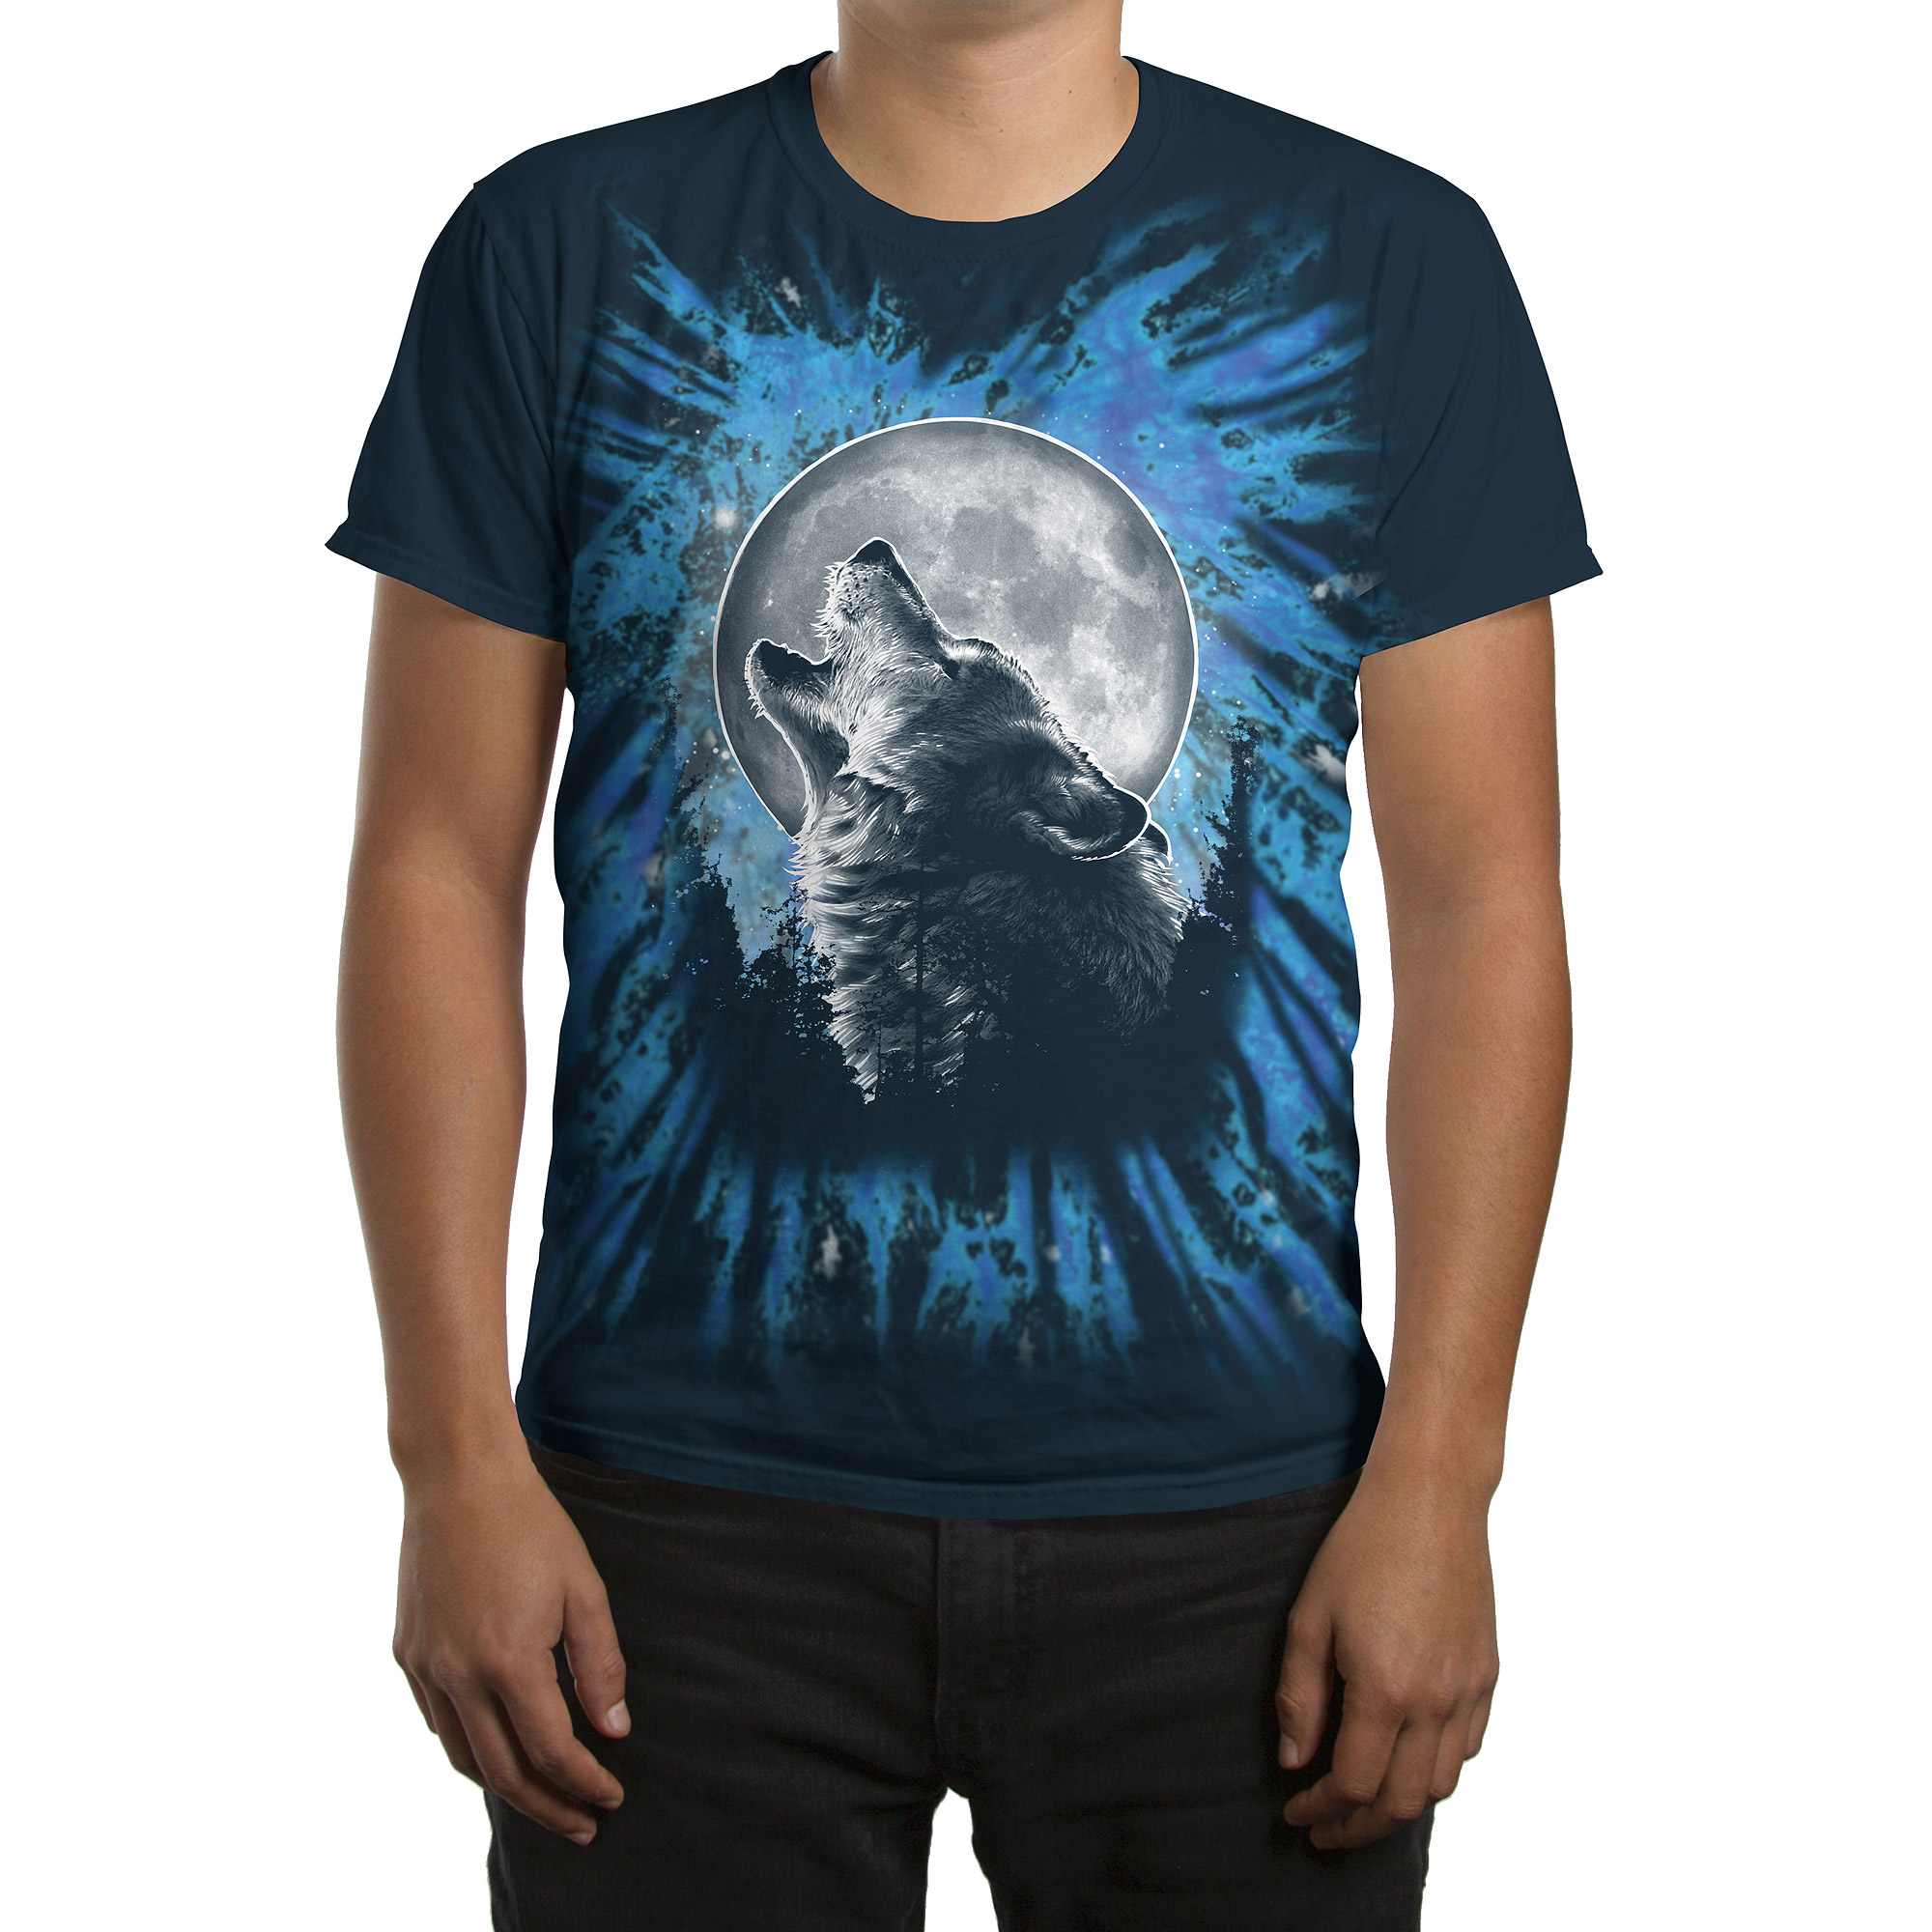 Black t shirt at walmart - Black T Shirt At Walmart 19